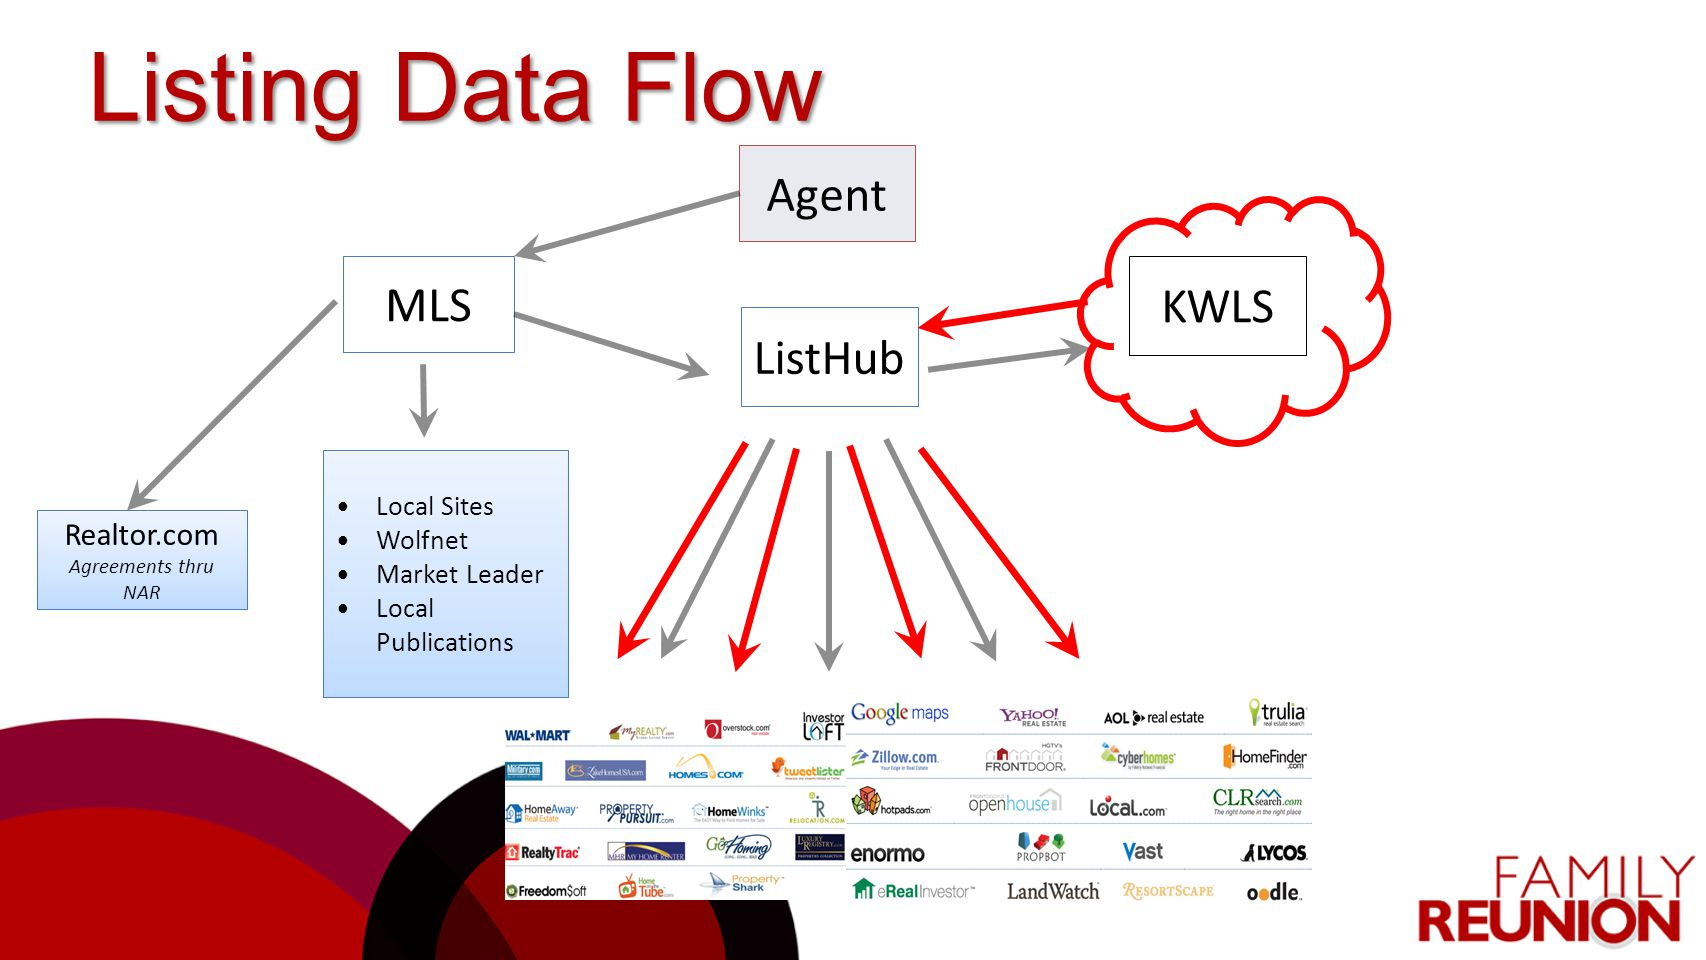 MLS Agent KWLS ListHub Realtor.com Agreements thru NAR Local Sites Wolfnet Market Leader Local Publications Listing Data Flow